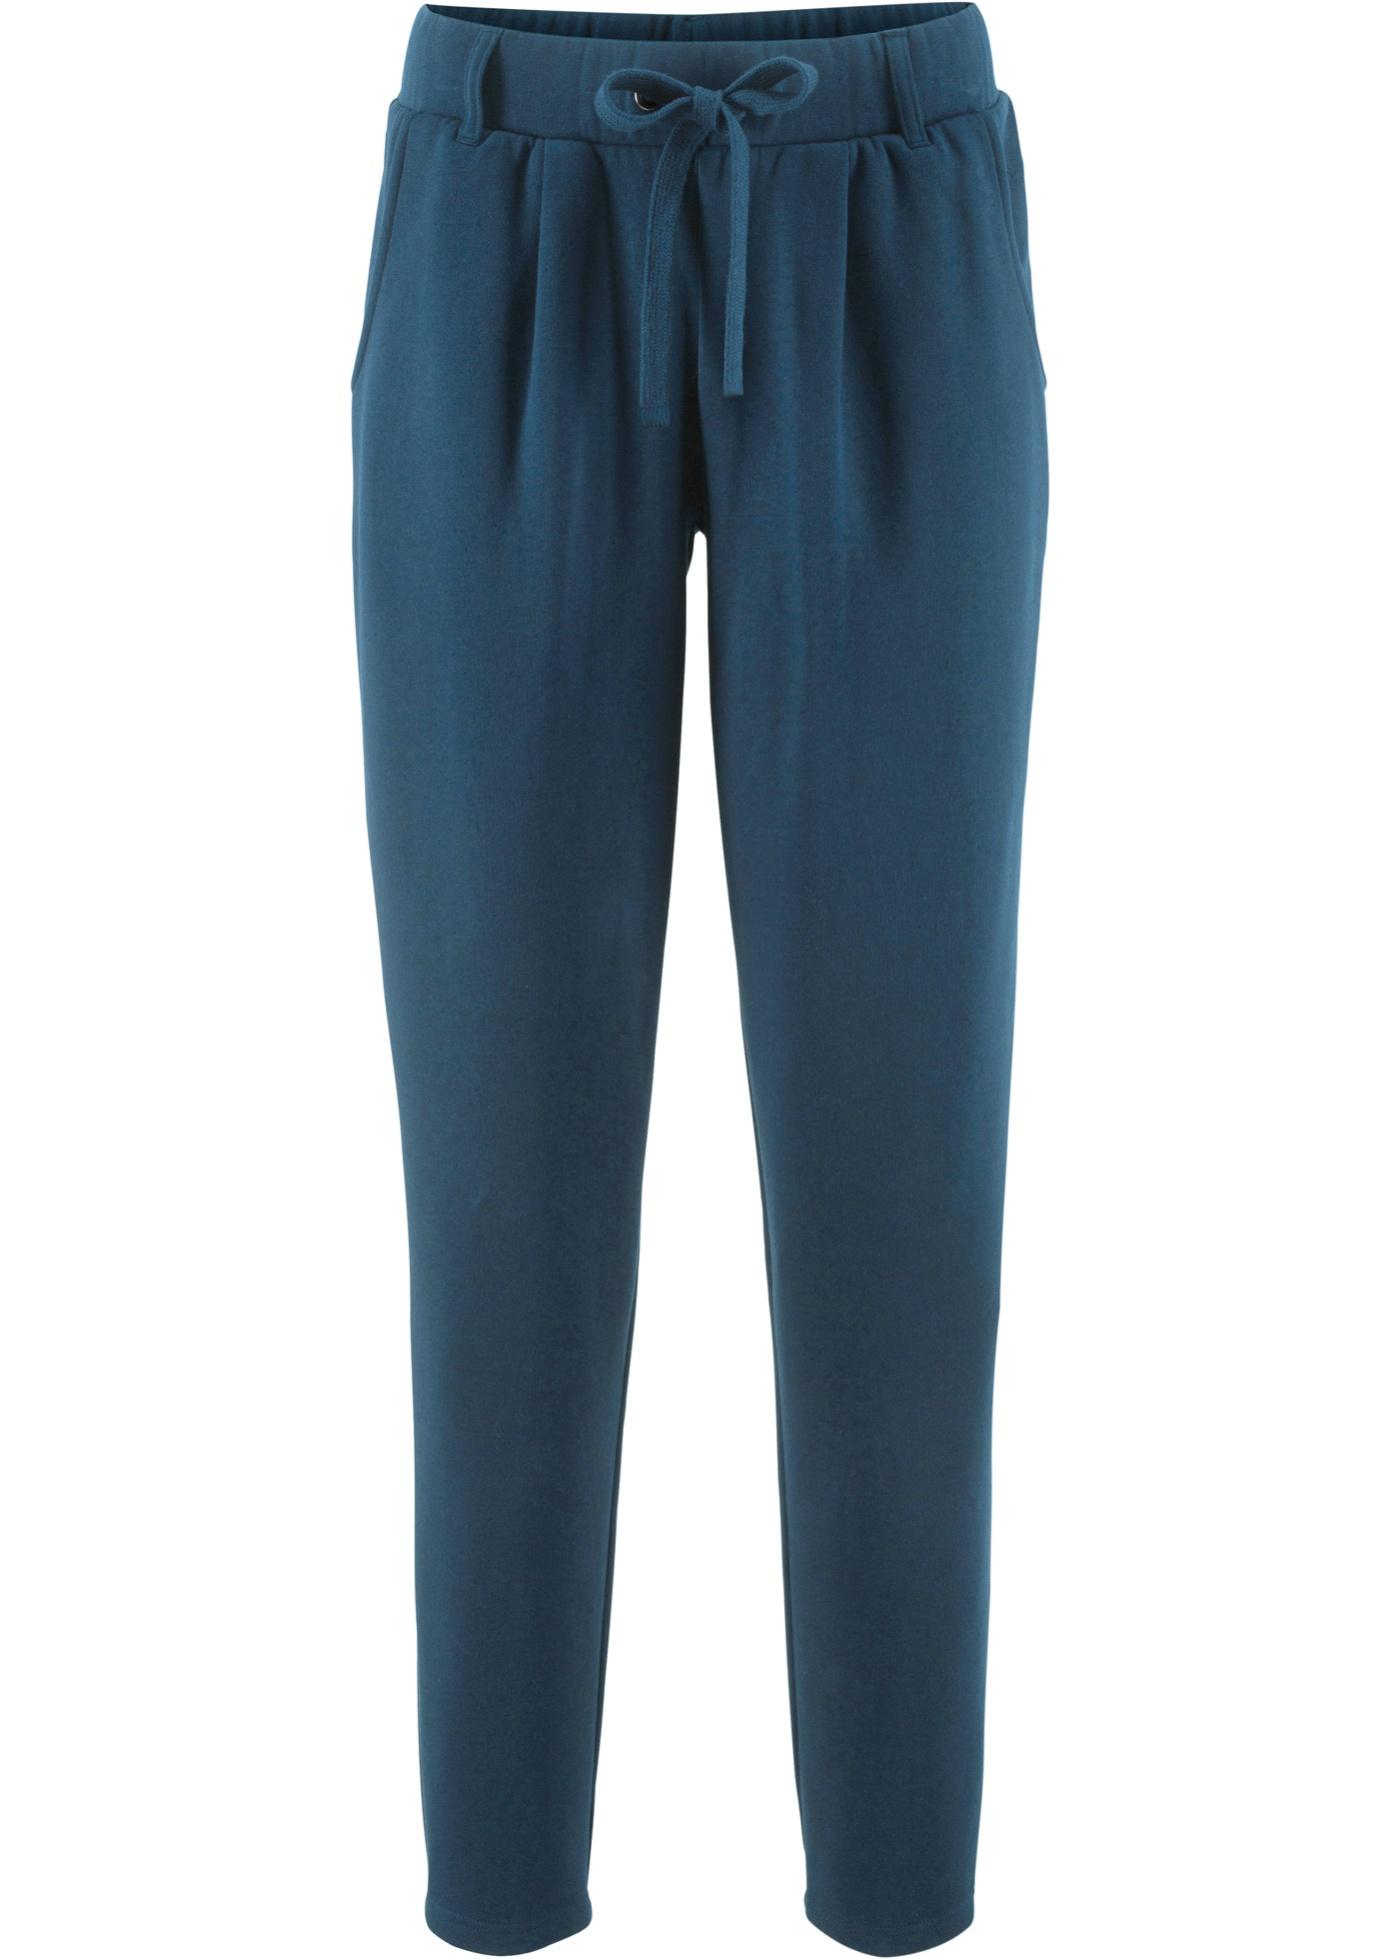 Bpc Bonprix Sweat Bleu Pour Femme CollectionPantalon BWrECedoQx